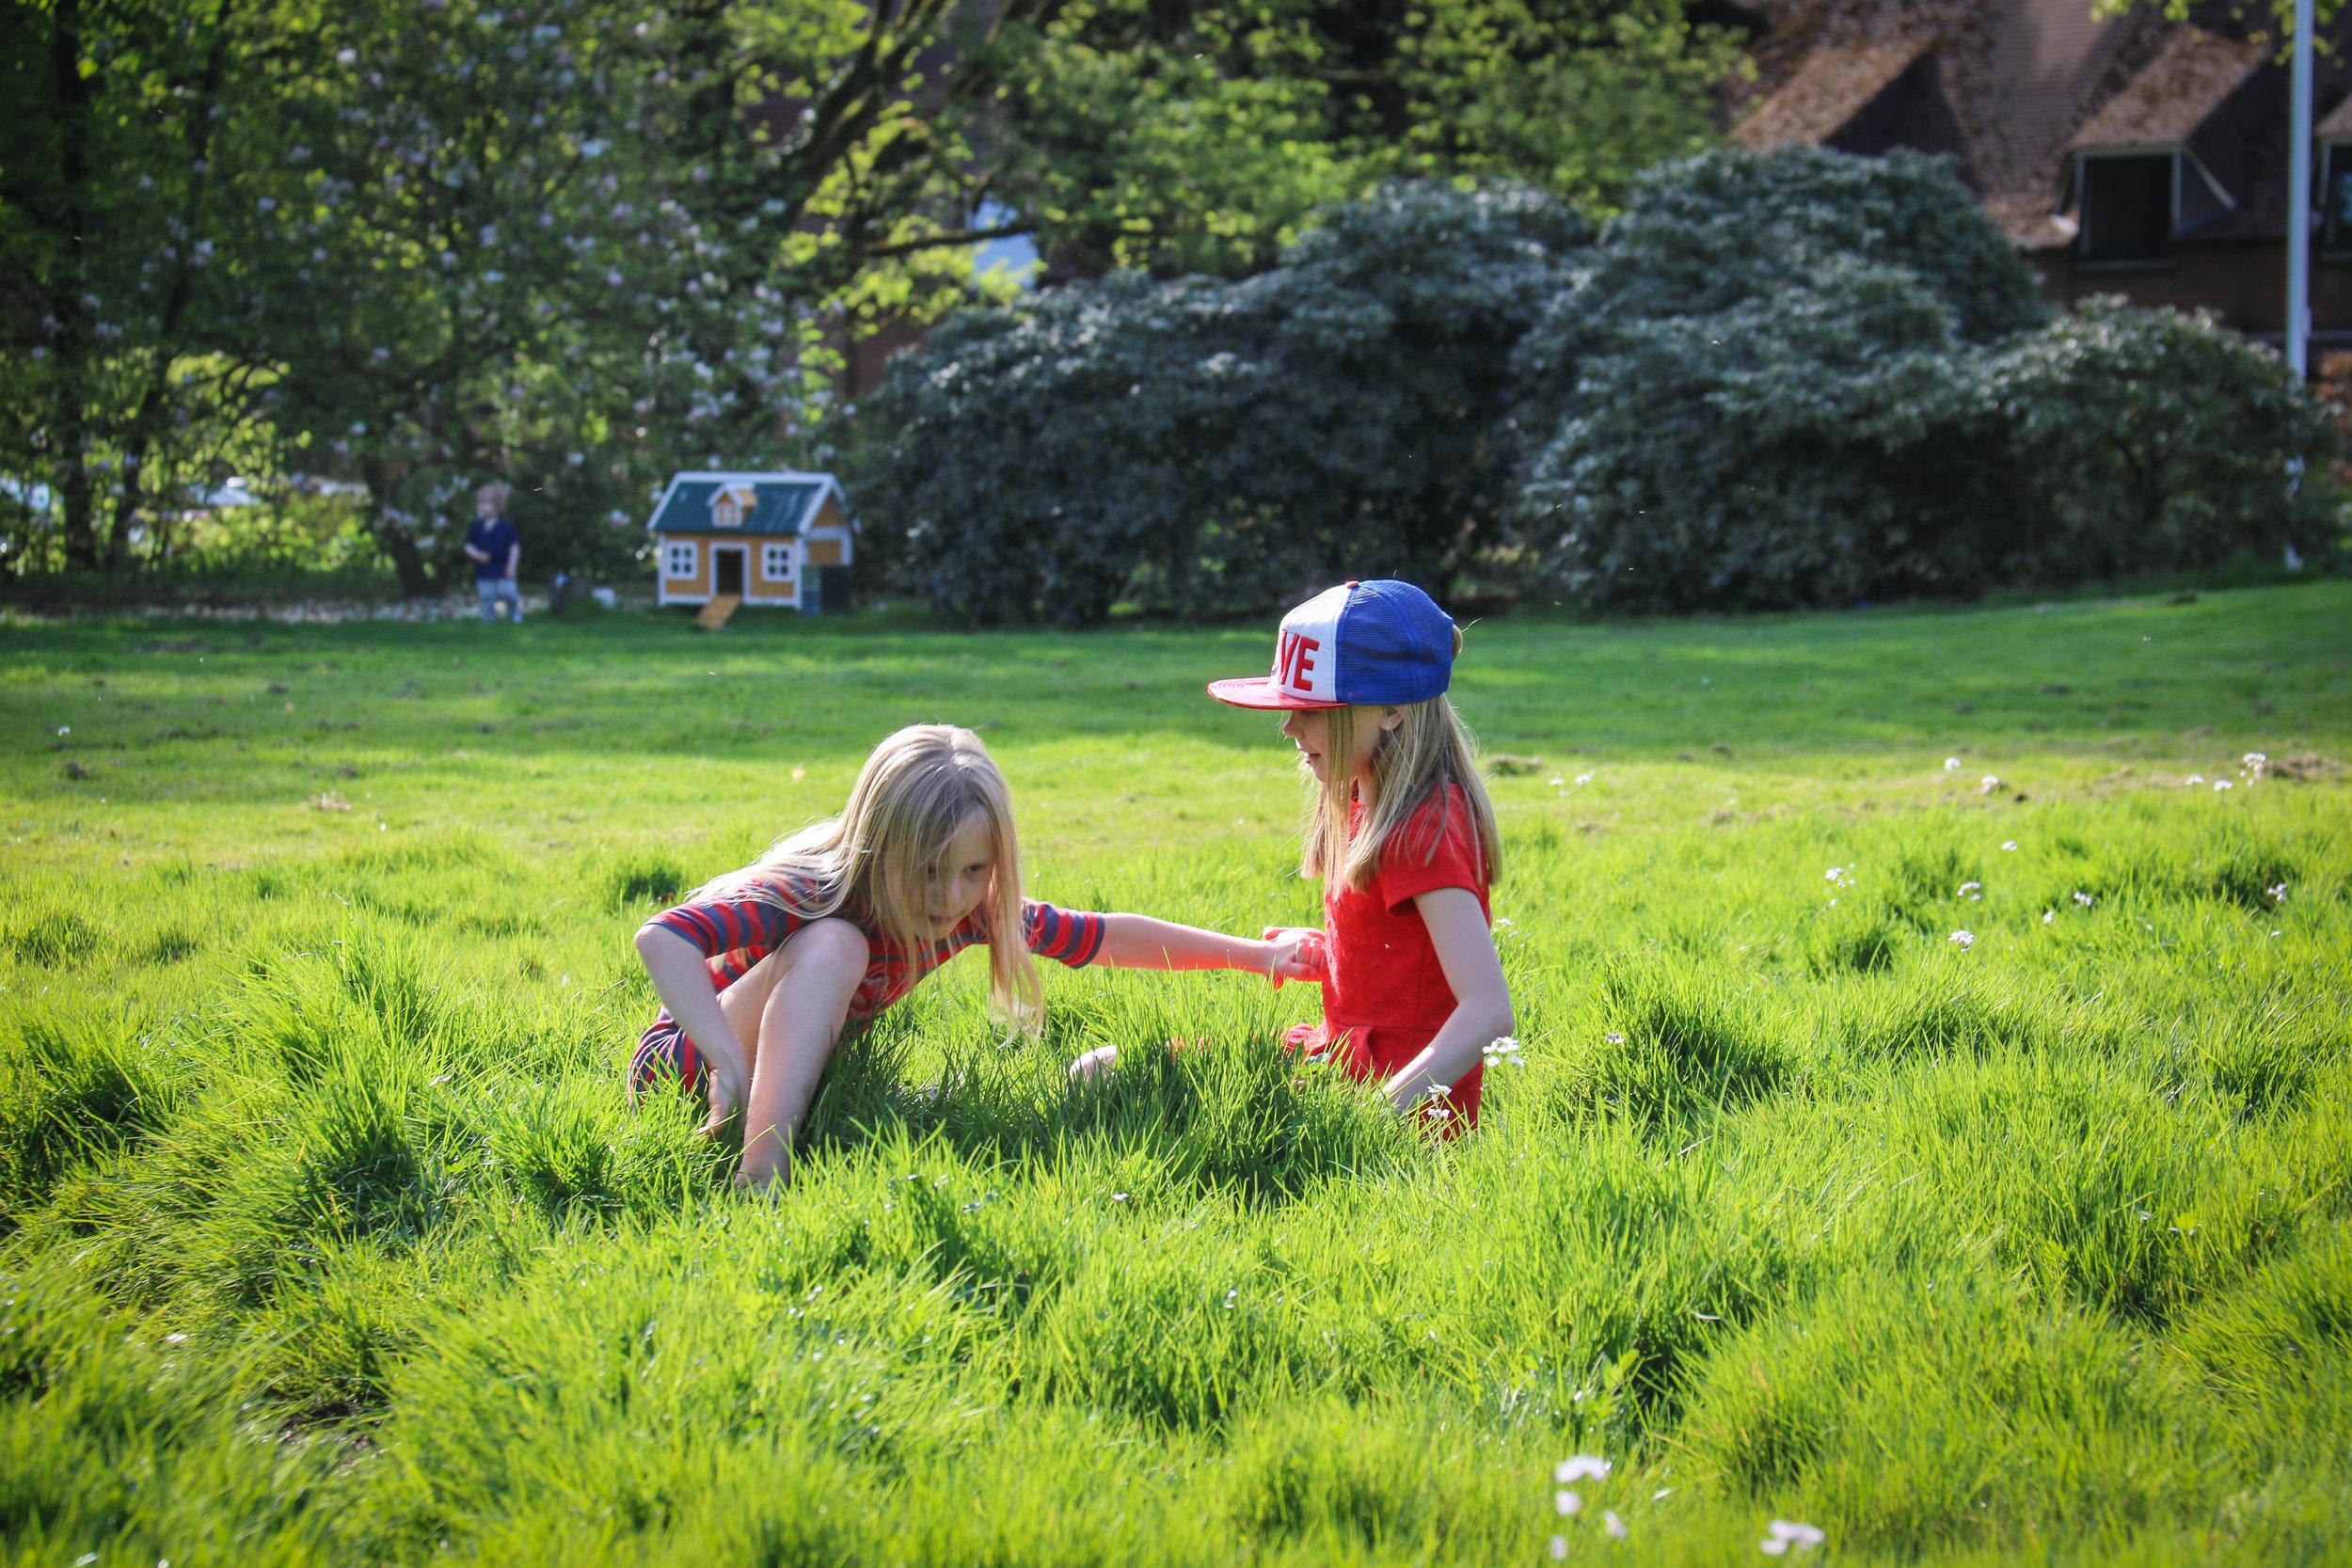 Fun by running through the bumpy grass field